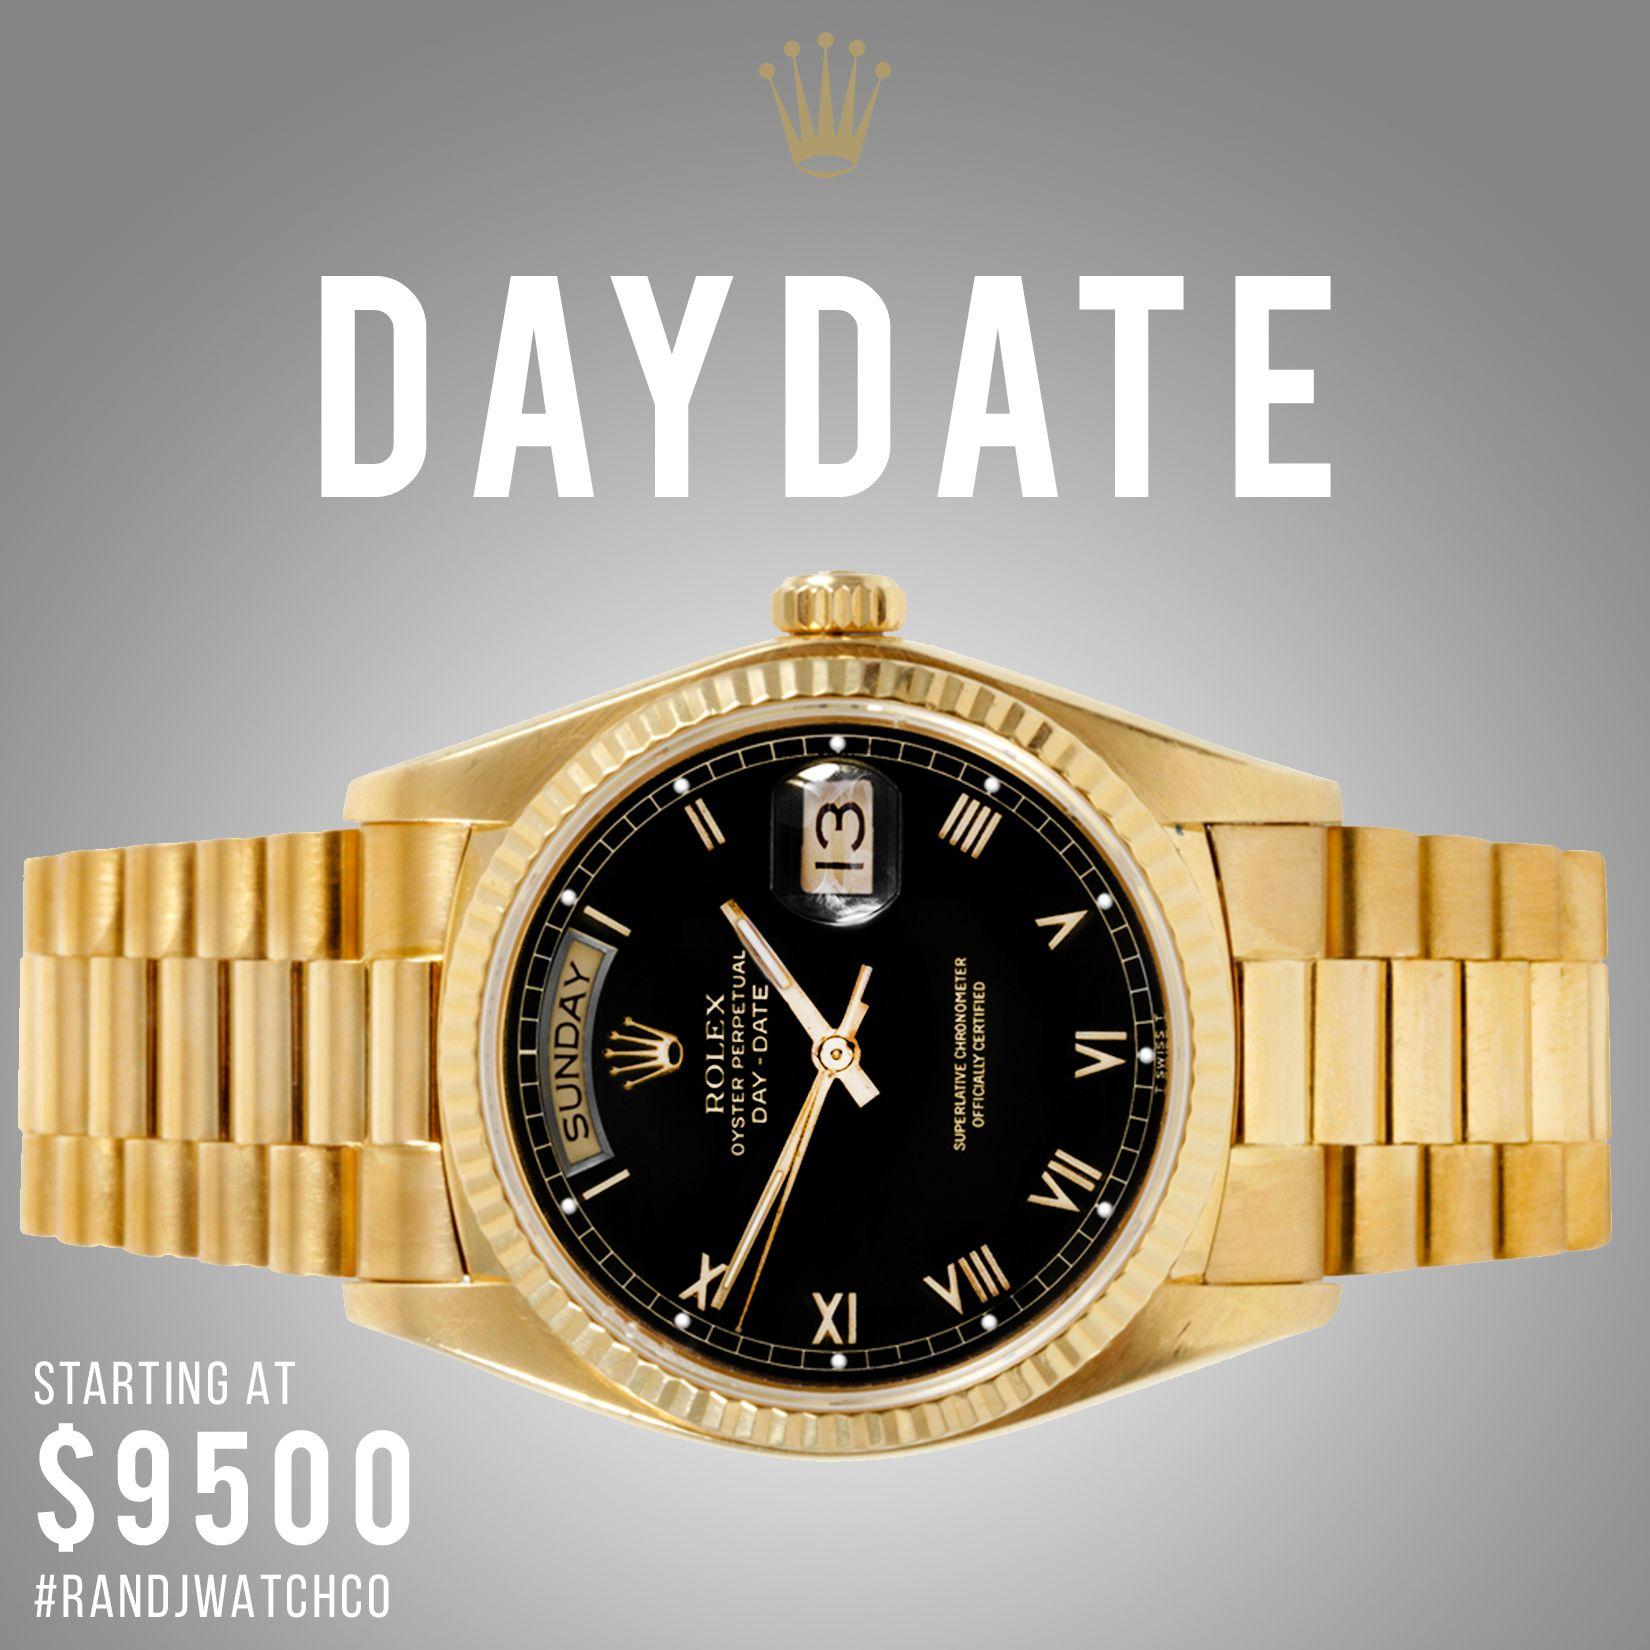 Daydate on sale email us at sales@randjwatchco.com